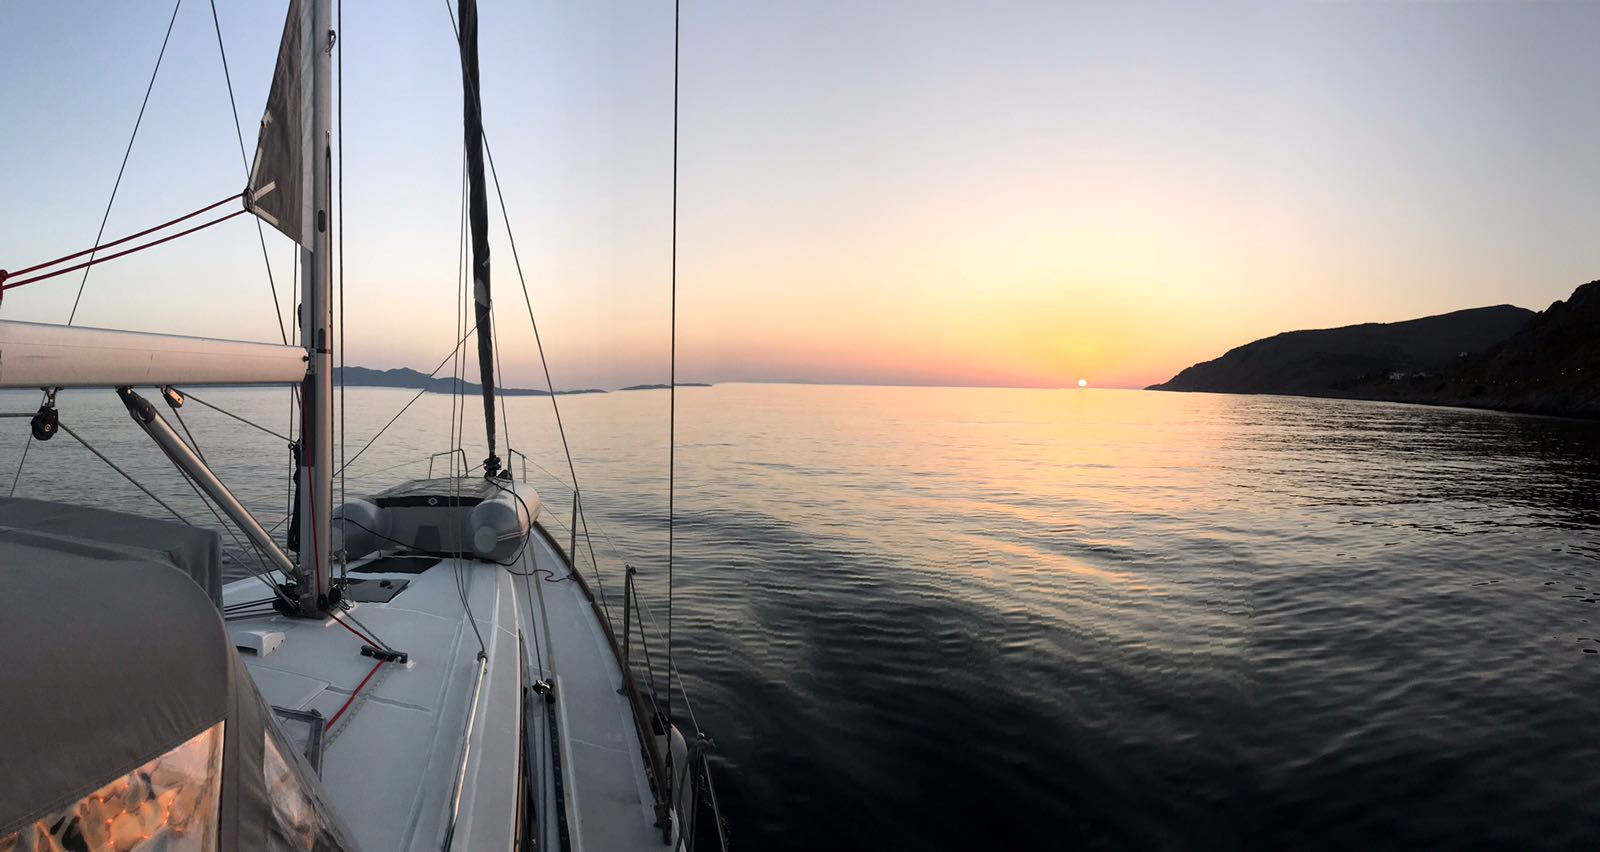 Sunrise Poros Greece Oceanis 38 Ortsasailing